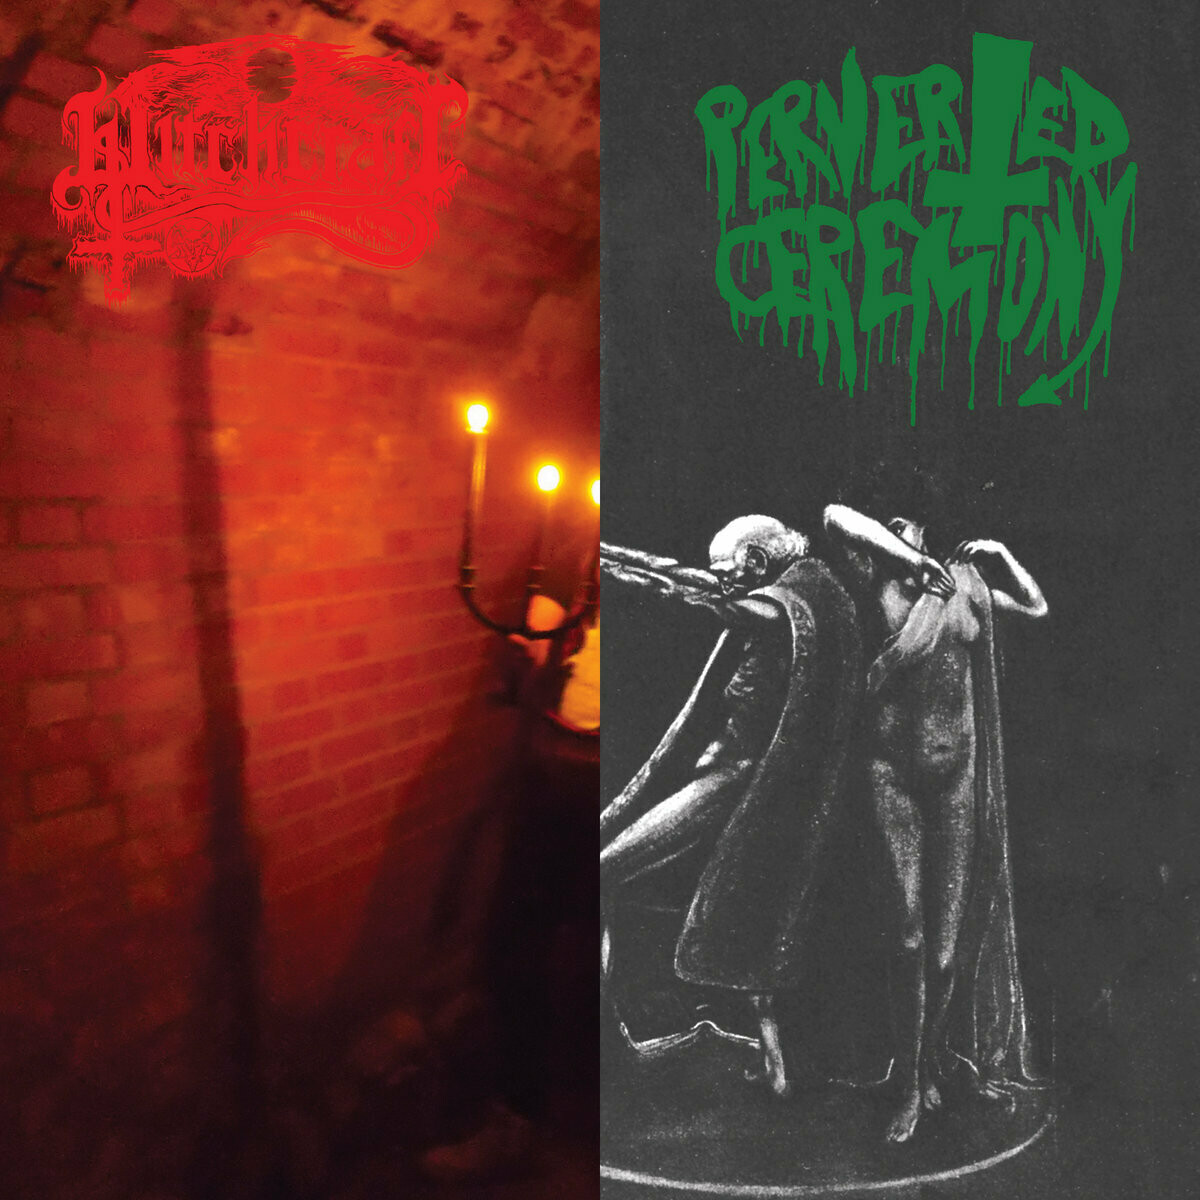 Perverted Ceremony / Witchcraft - Nighermancie